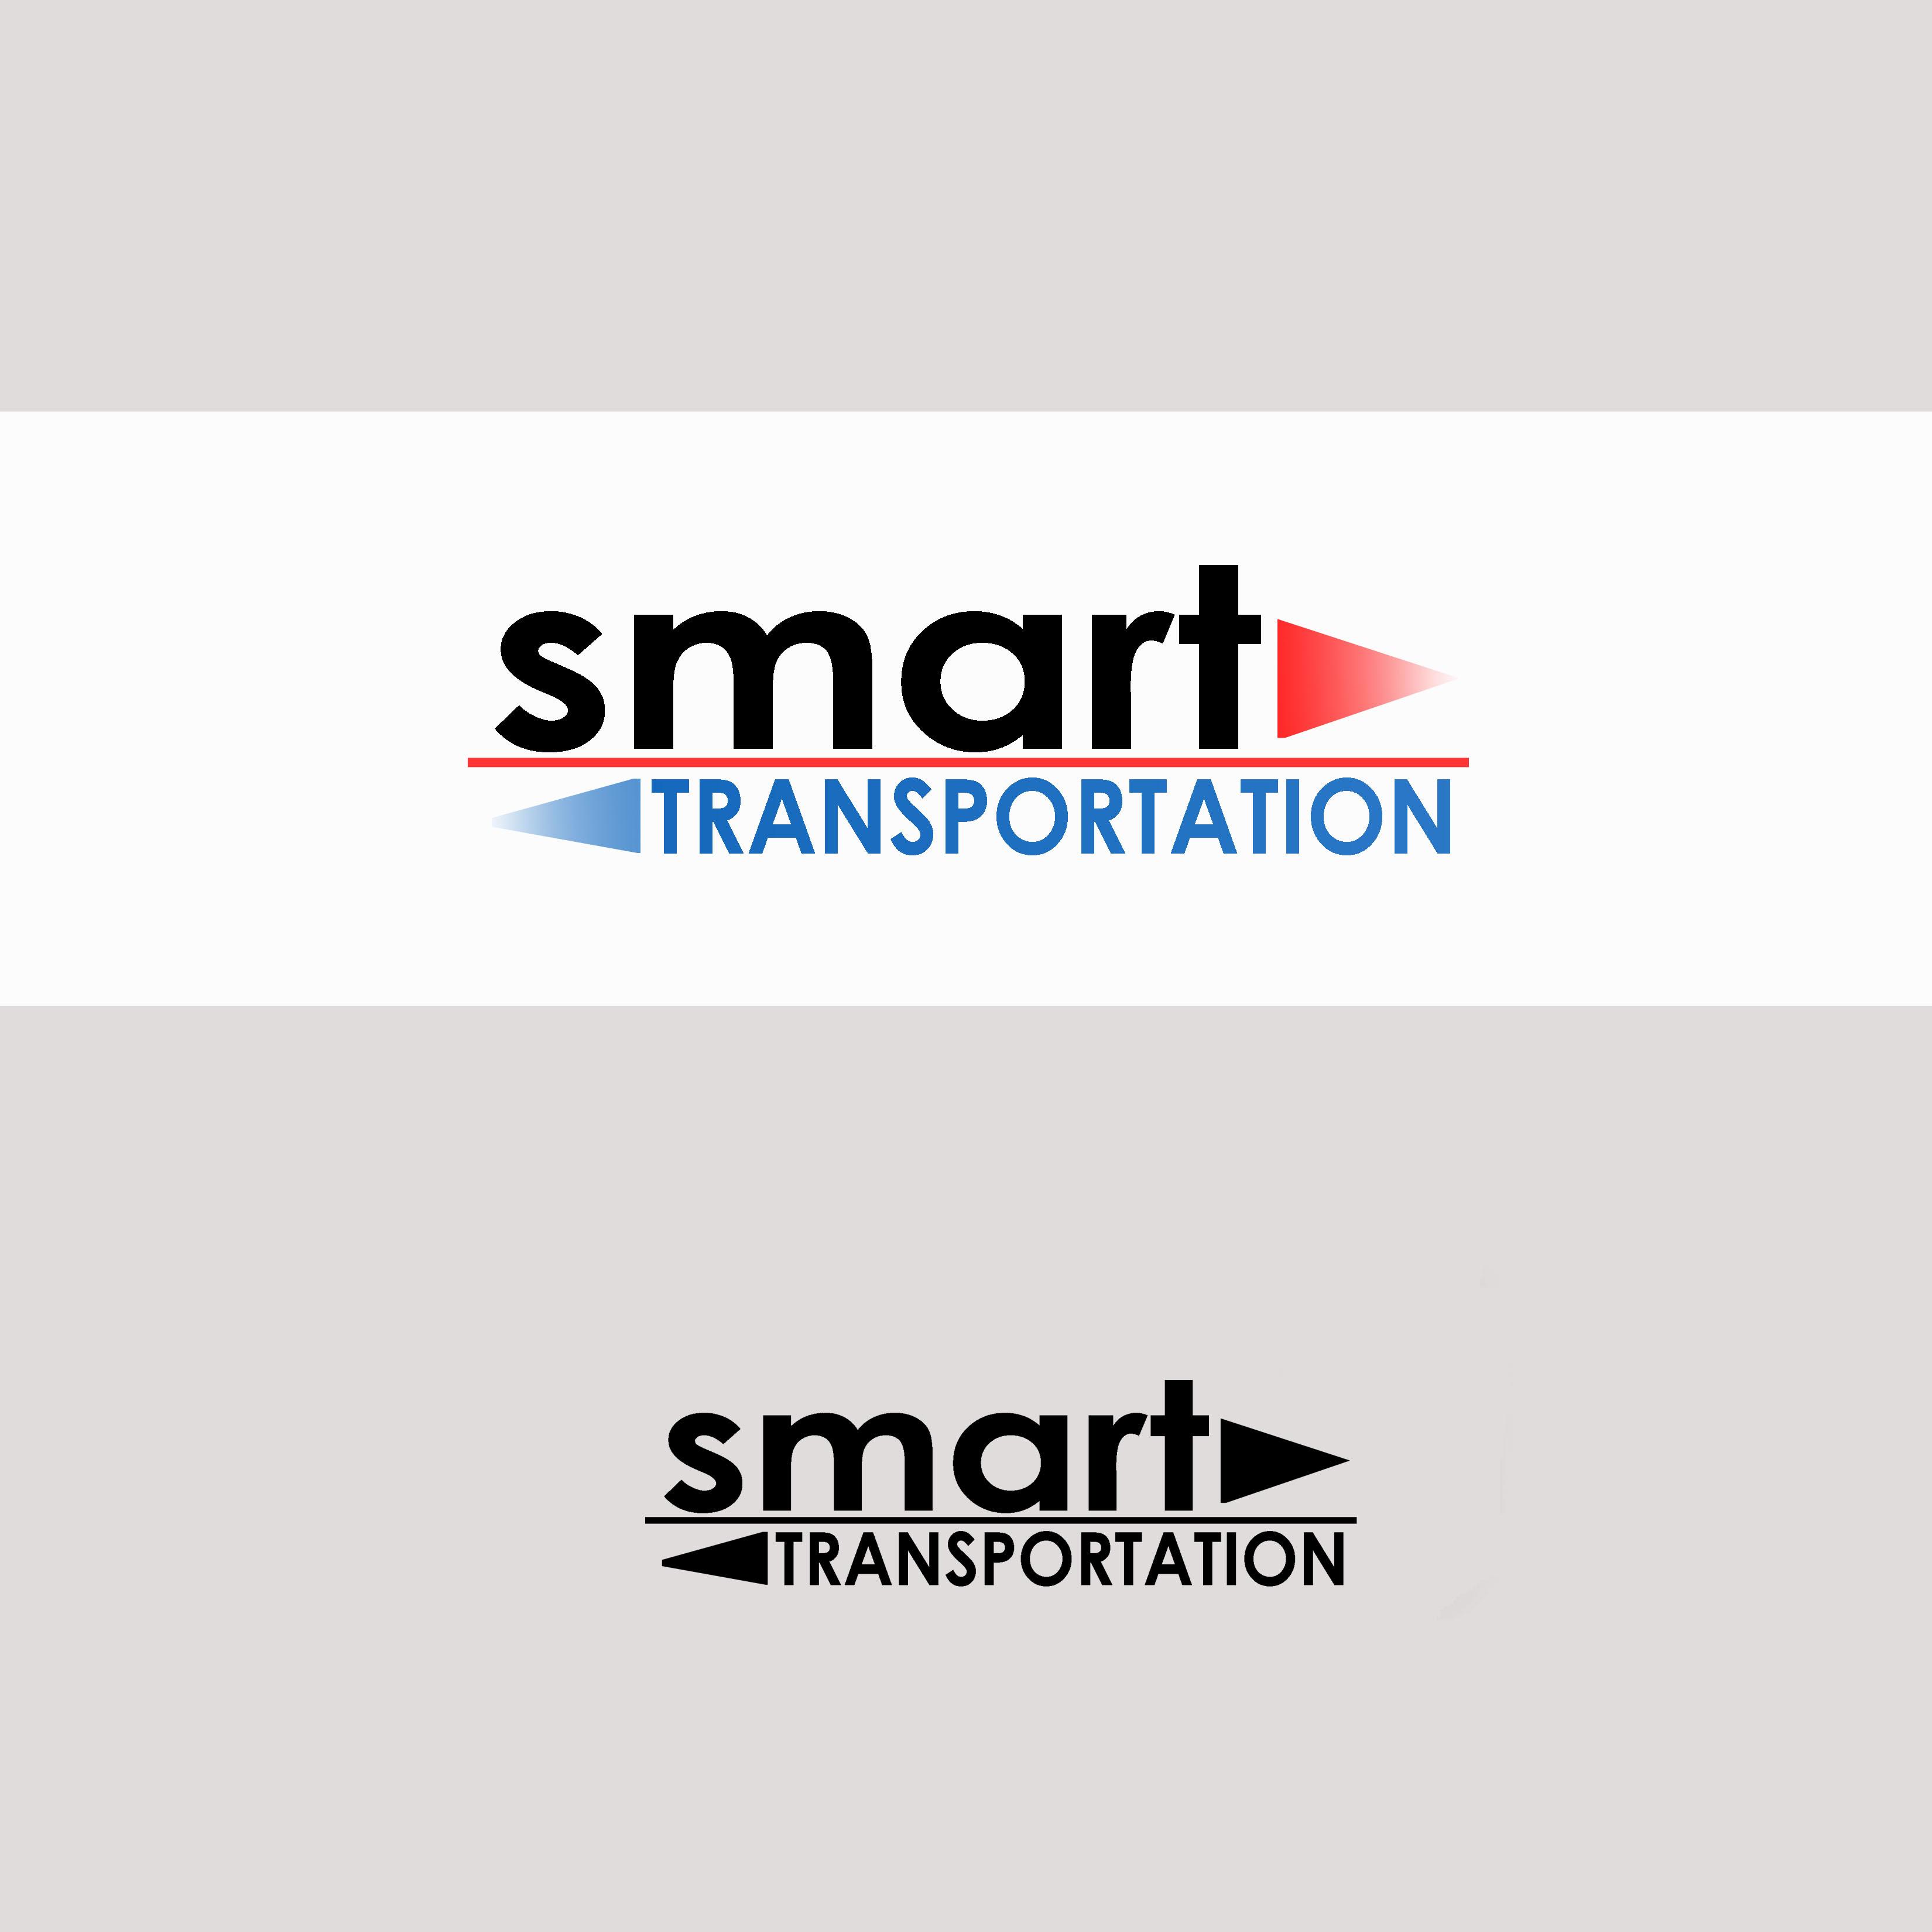 Logo Design by Allan Esclamado - Entry No. 8 in the Logo Design Contest Imaginative Logo Design for Smart Transportation.